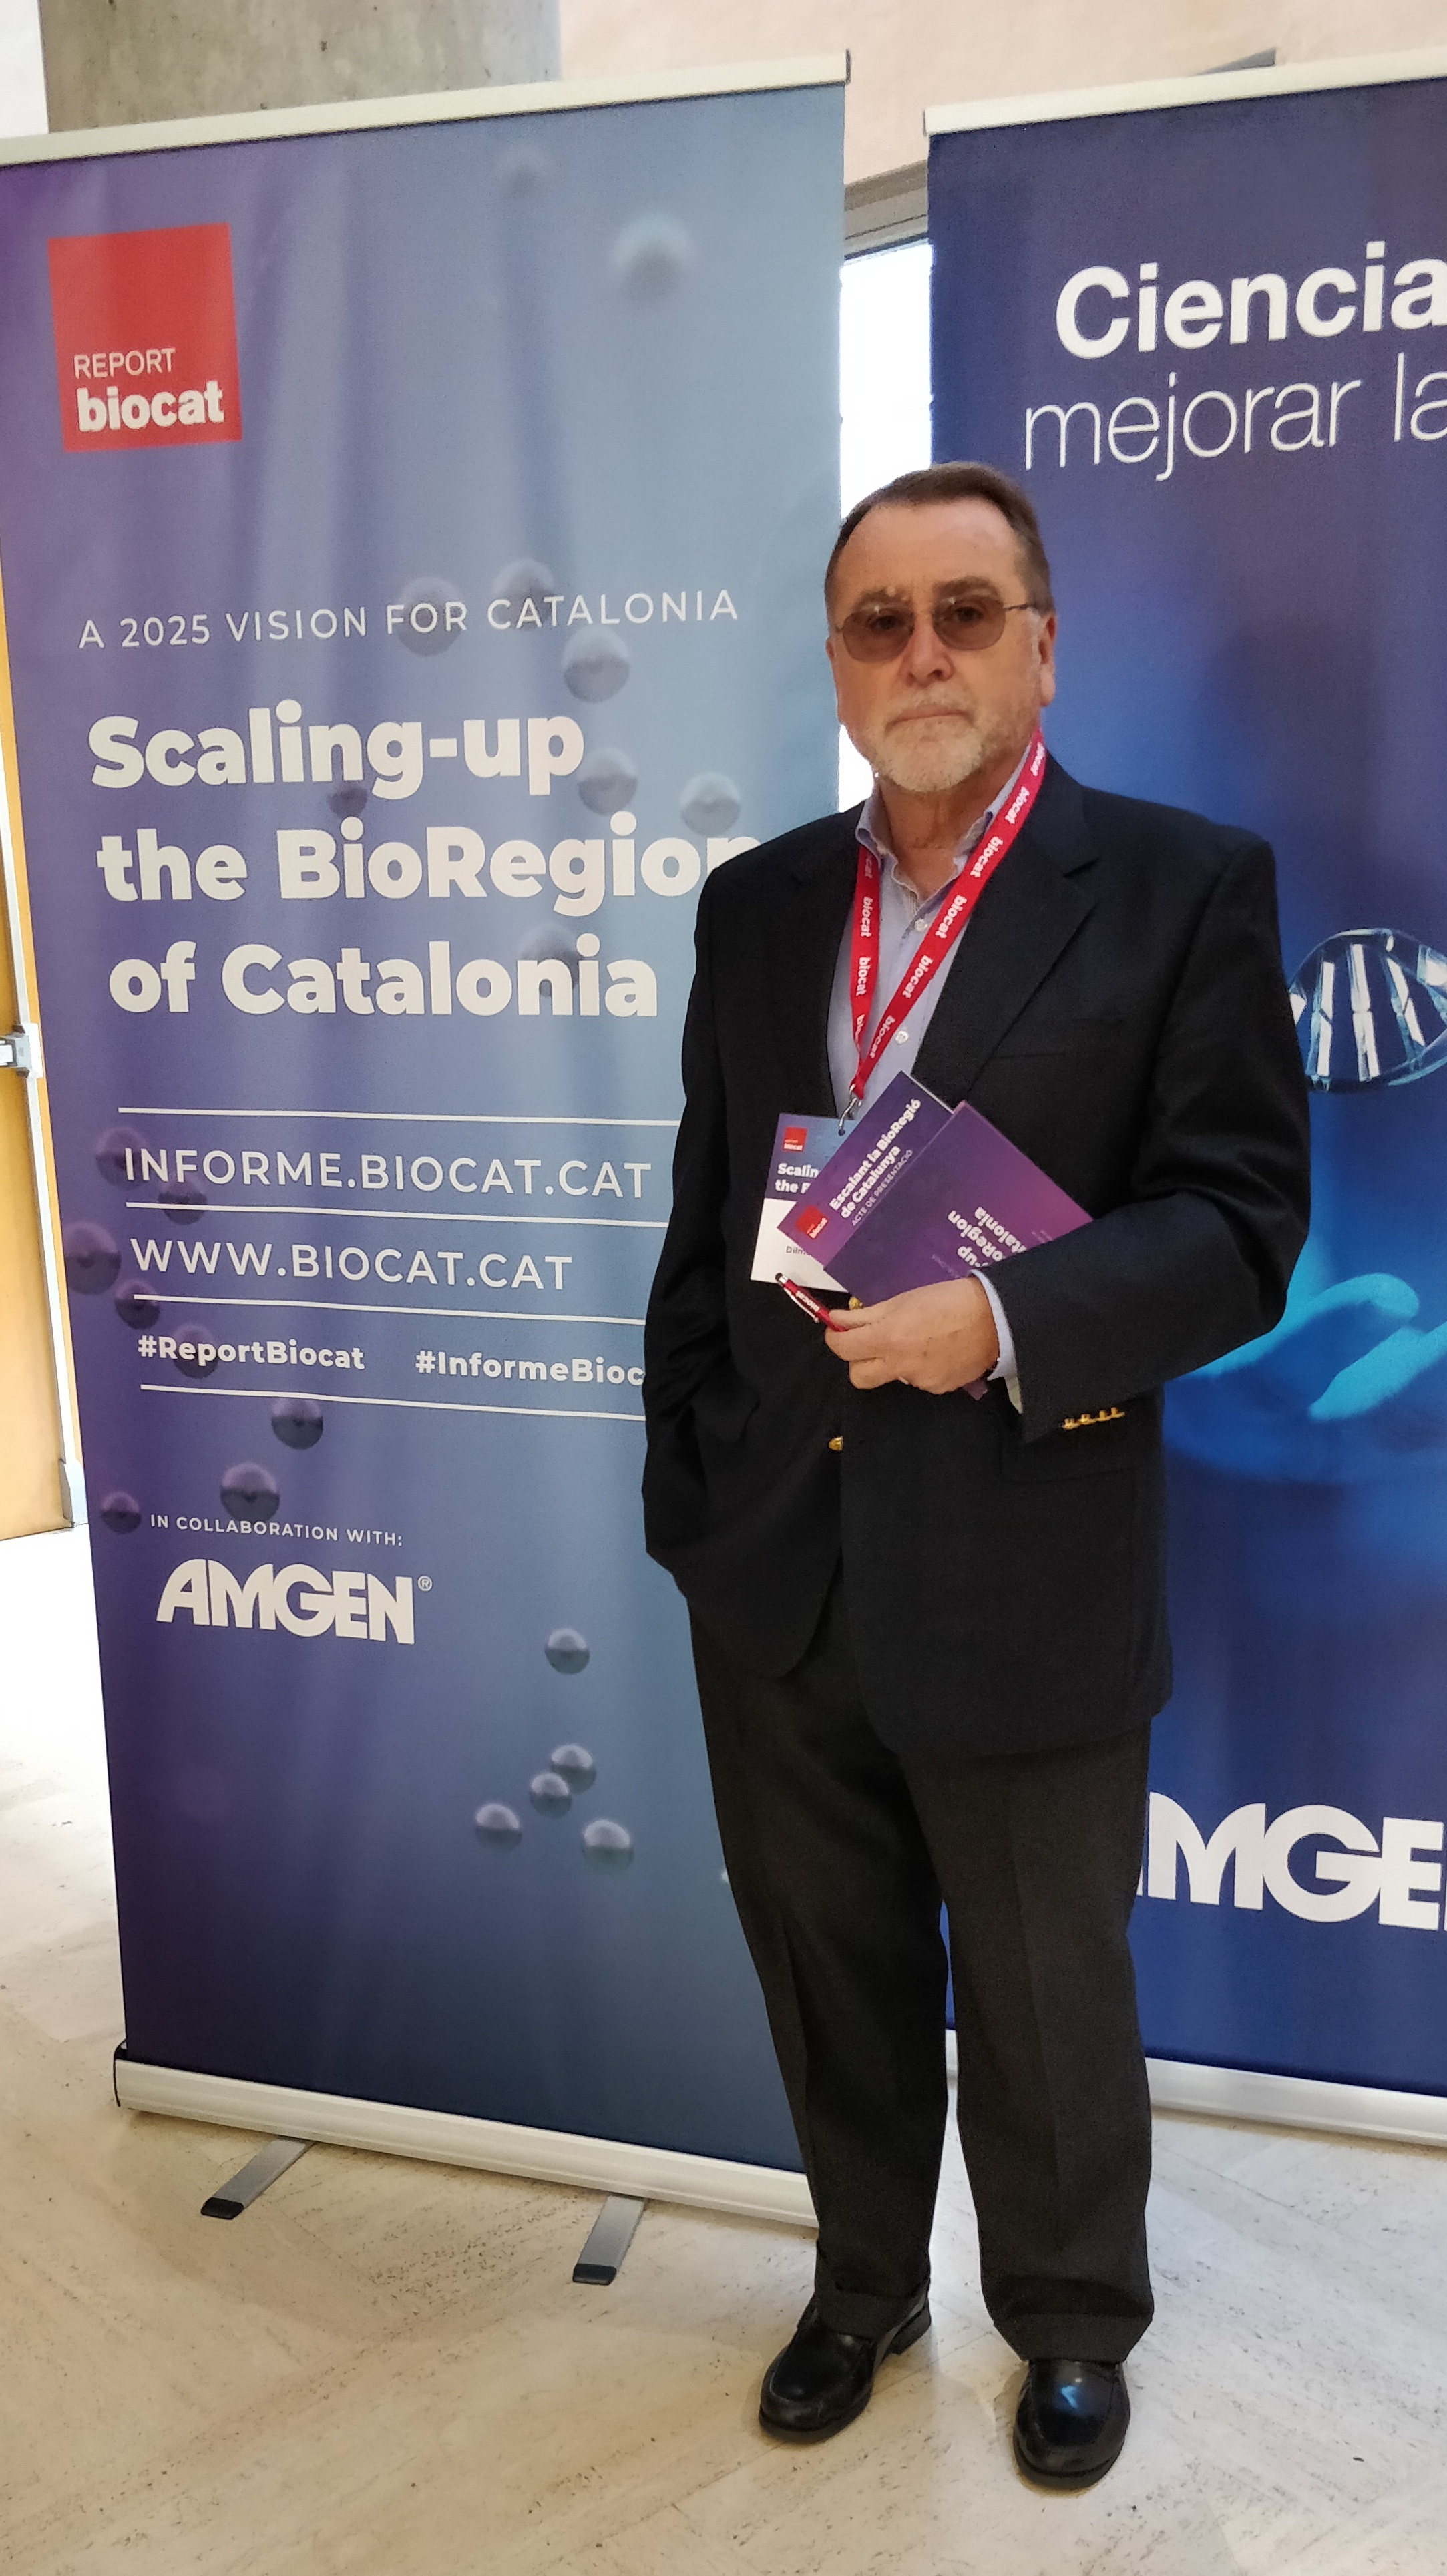 Ignasi Maestre asistió a la presentación del informe de biocat